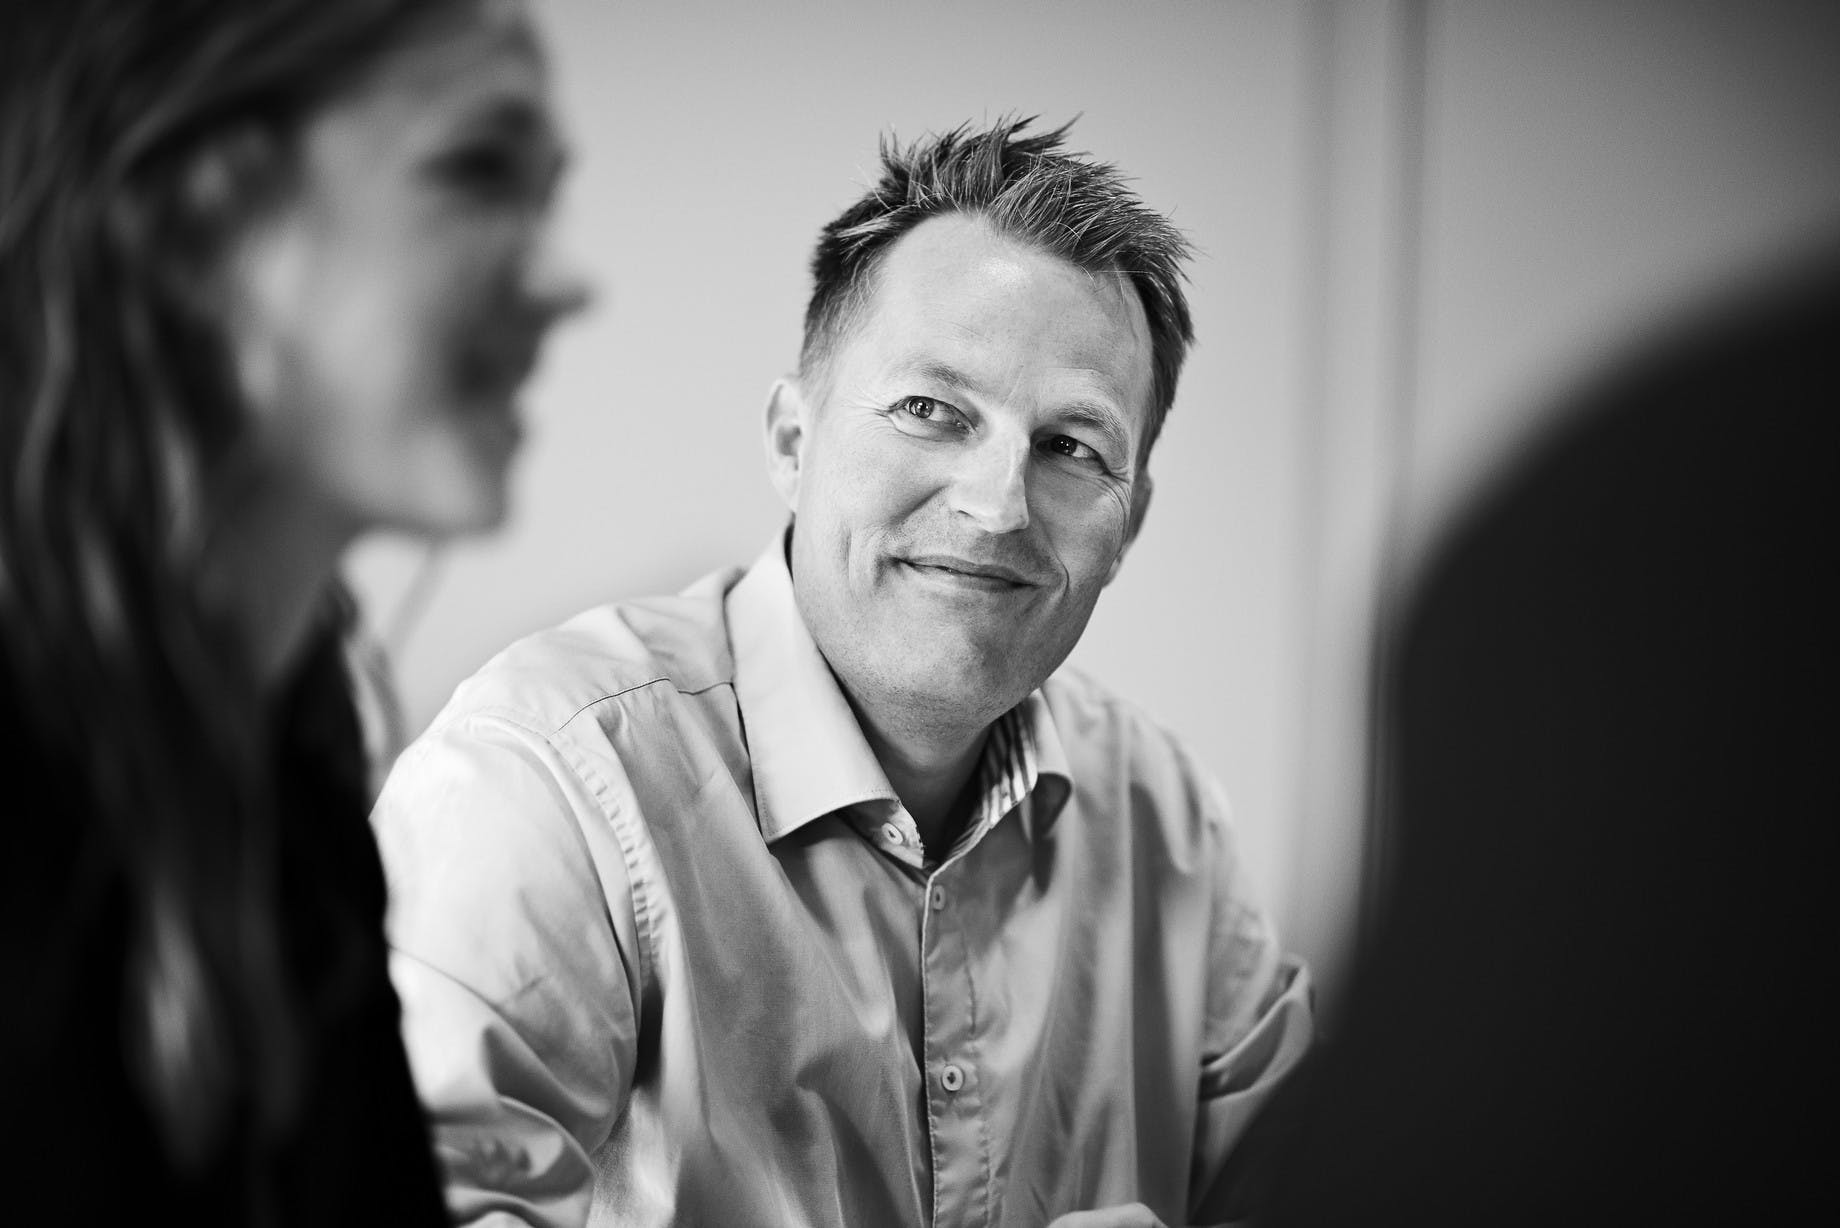 Jens Olav Johansen